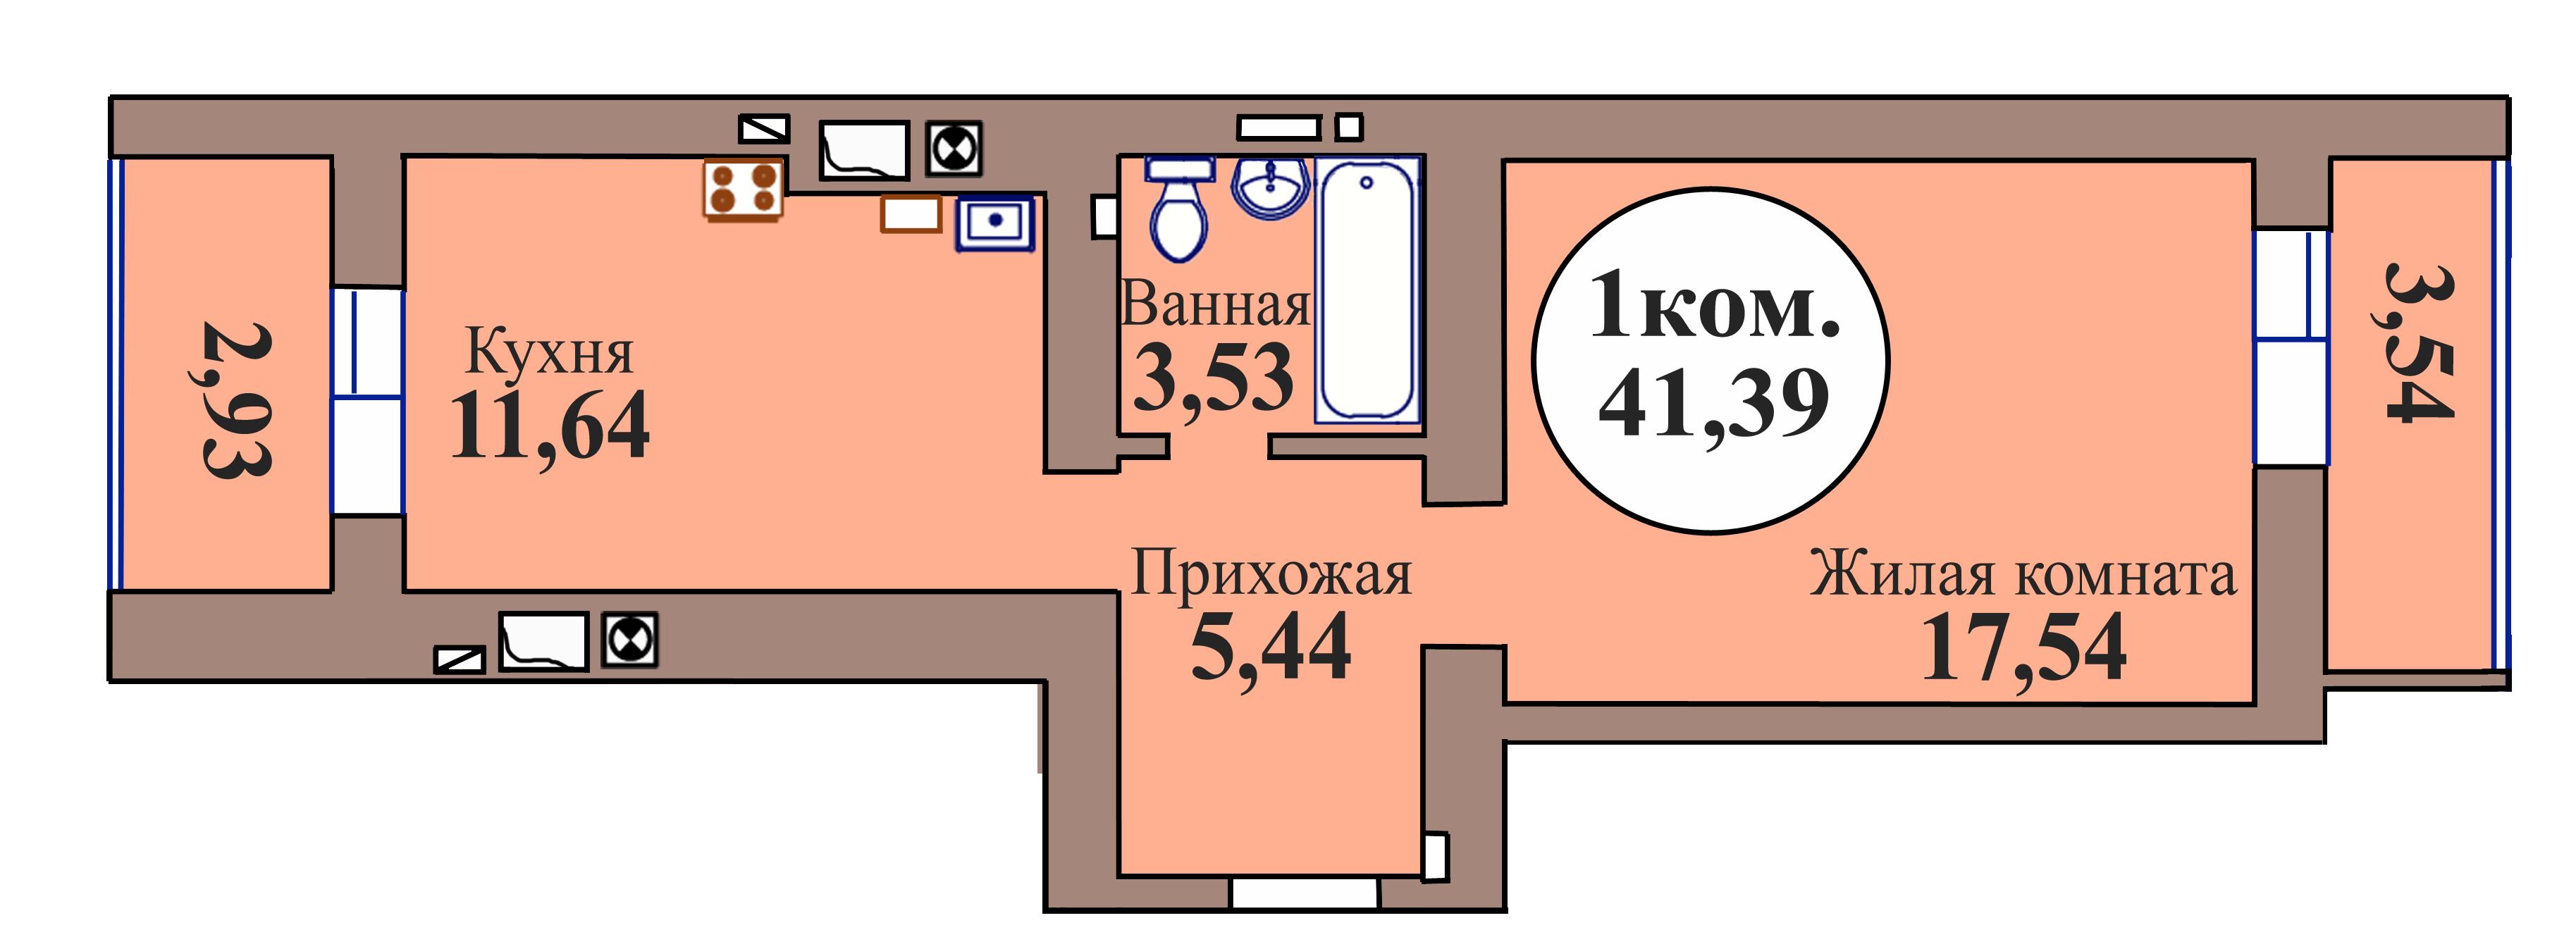 1-комн. кв. по пер. Калининградский, 5 кв. 55 в Калининграде